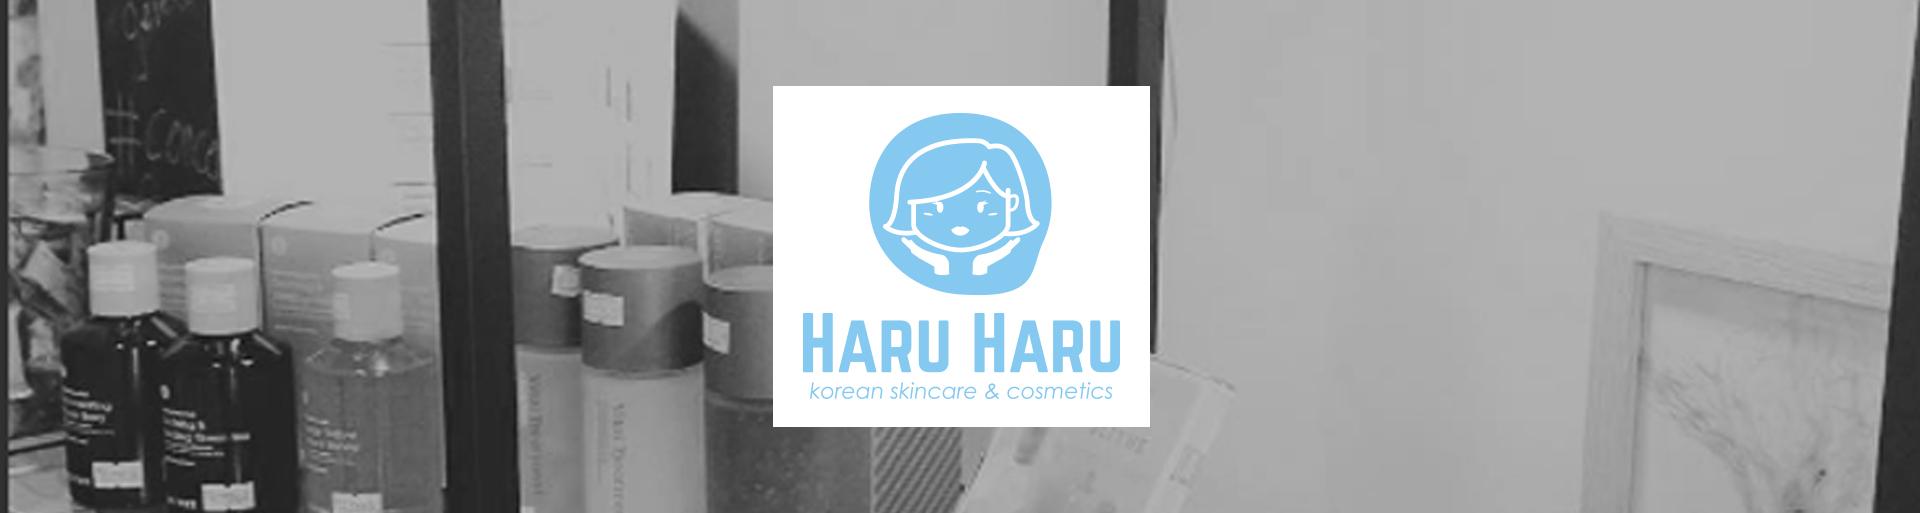 Haru Haru Beauty